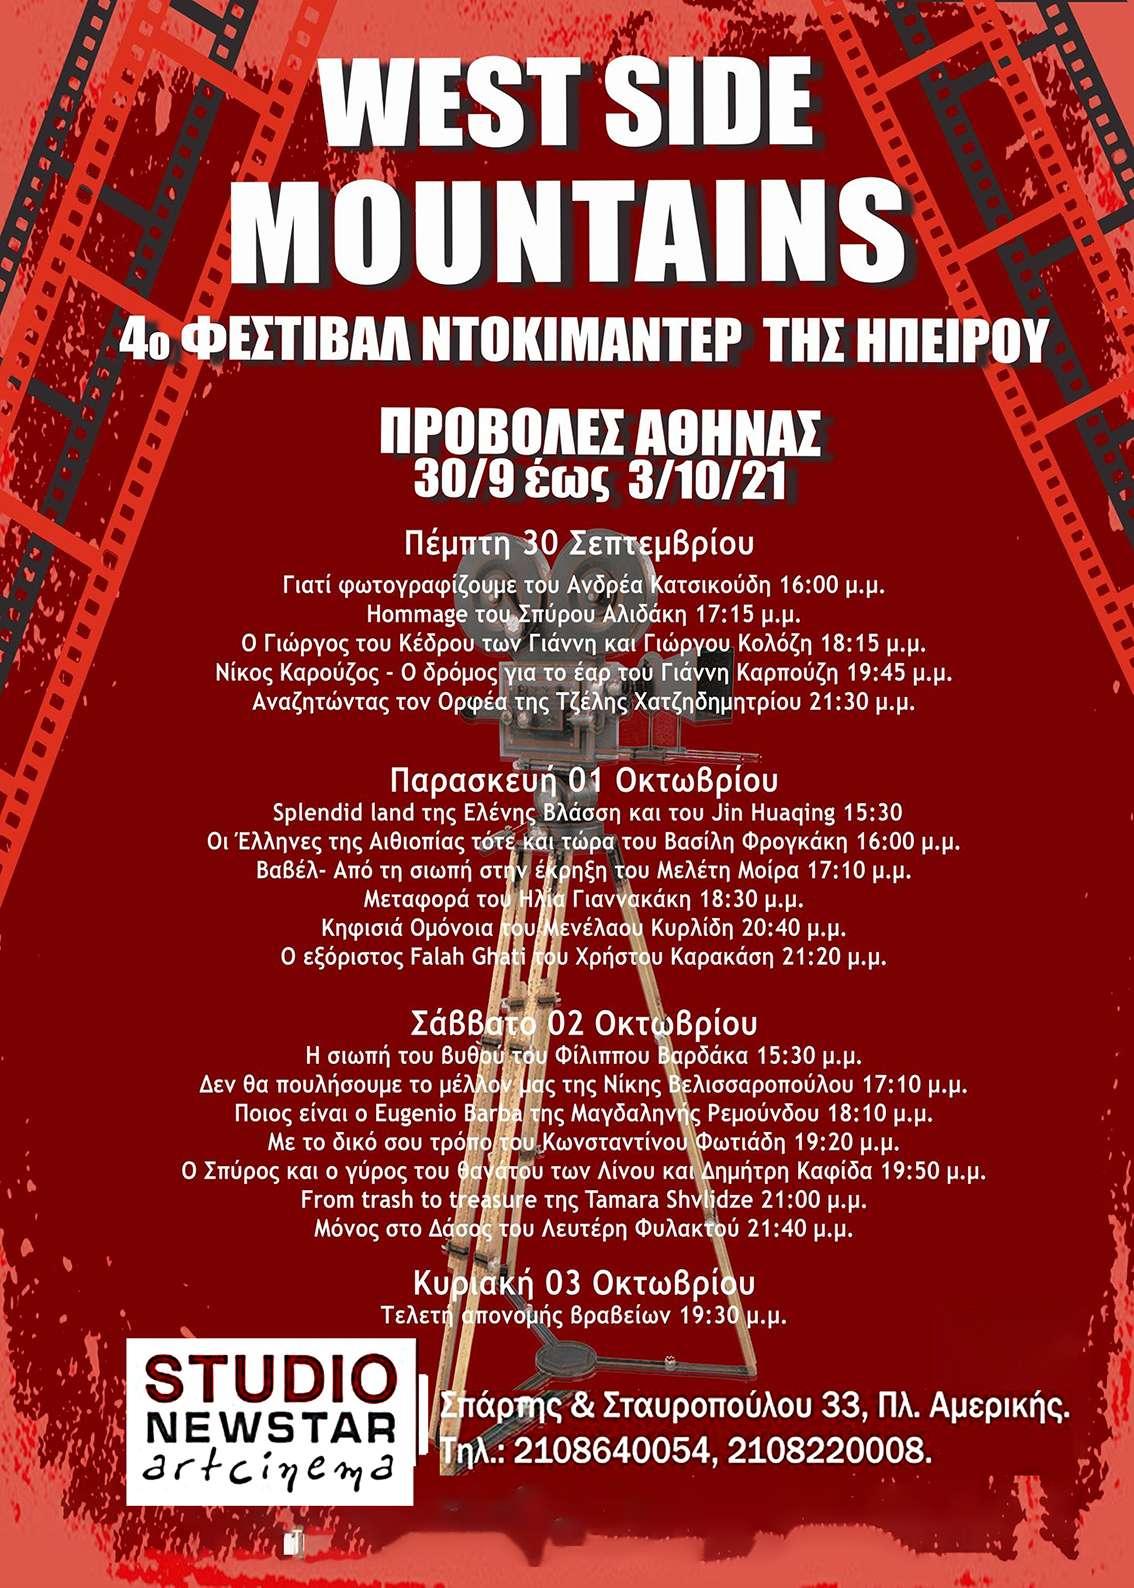 4th West Side Mountains Στην Αθήνα το 4ο Διεθνές Φεστιβάλ Ντοκιμαντέρ Ηπείρου Poster Studio Art Cinema